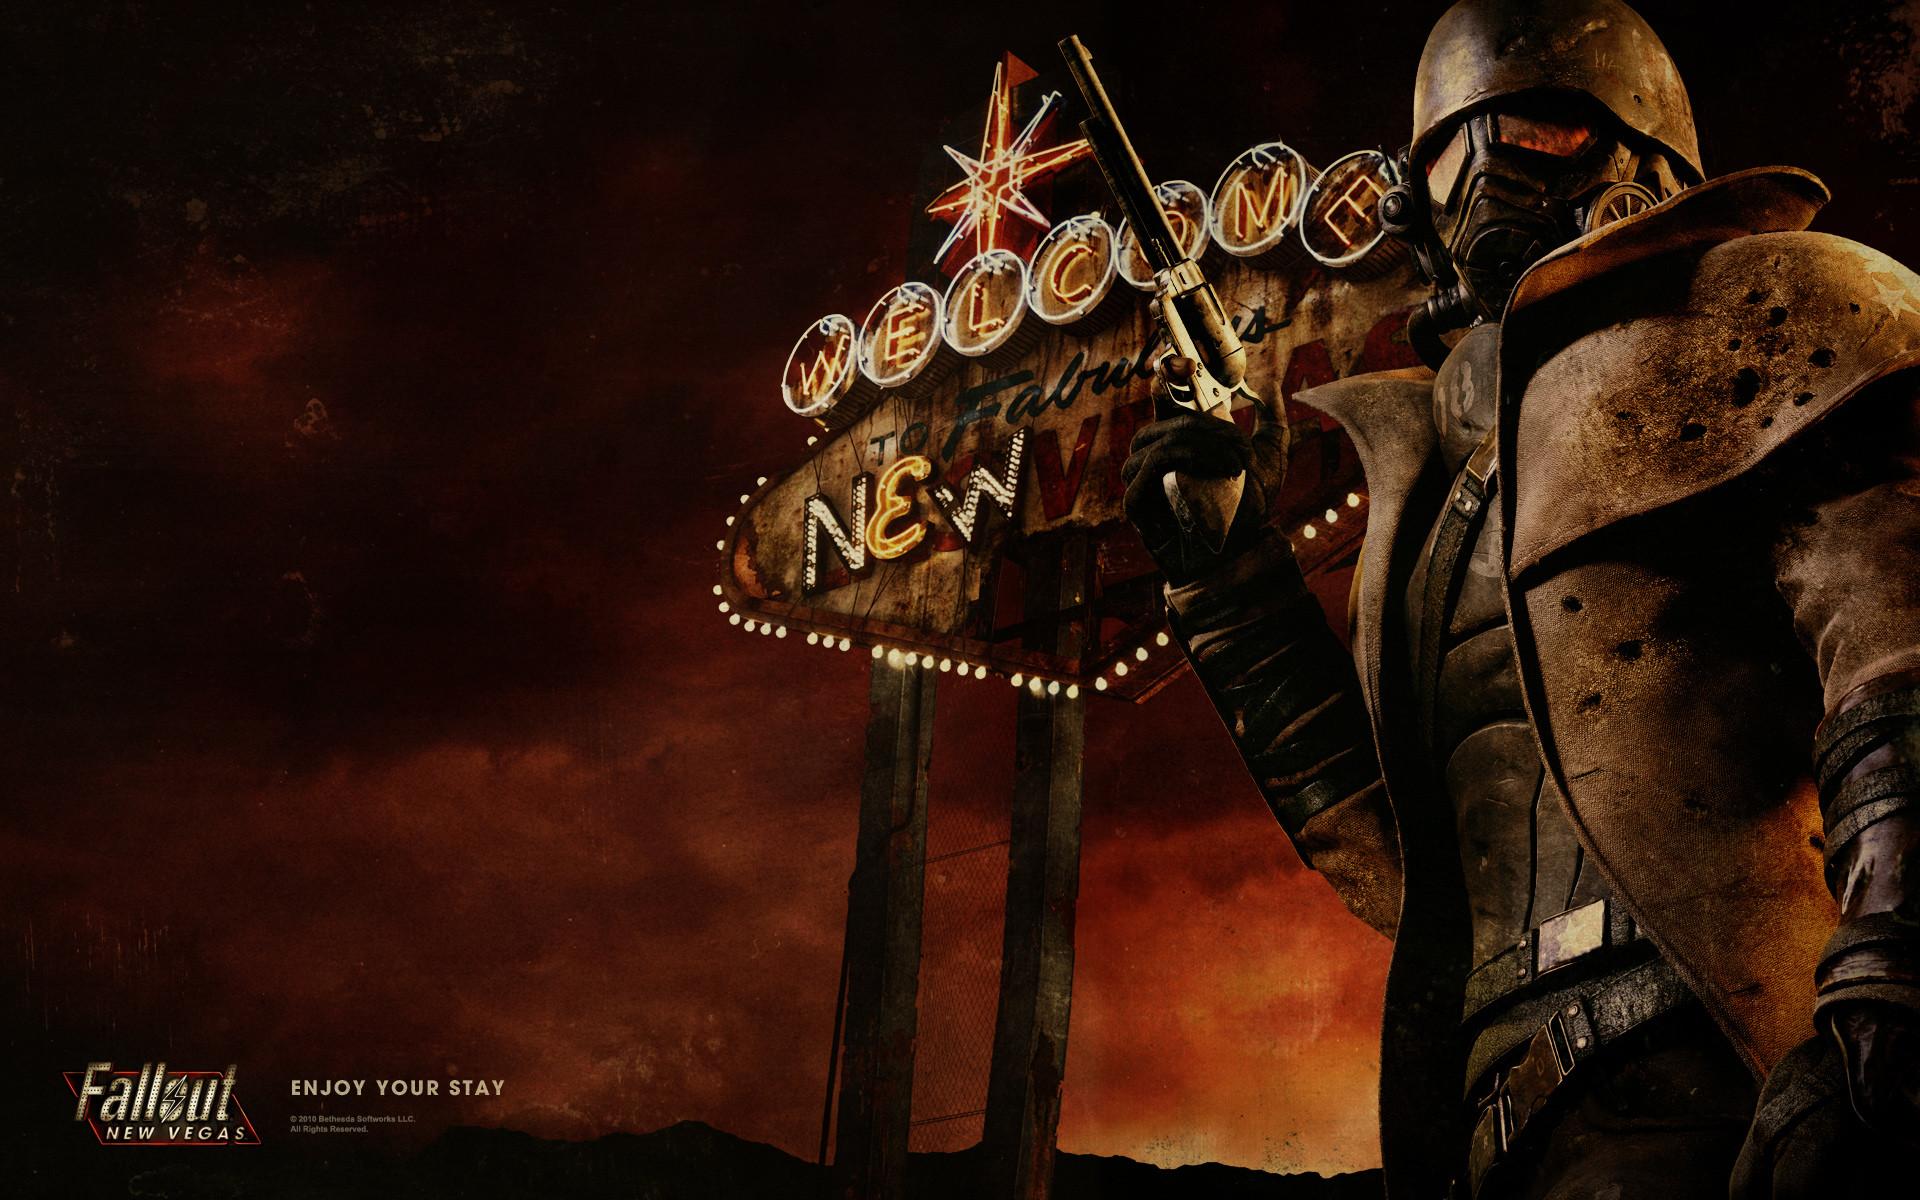 Fallout New Vegas Backgrounds Wallpaper   HD Wallpapers   Pinterest    Fallout, Wallpaper and Concept art